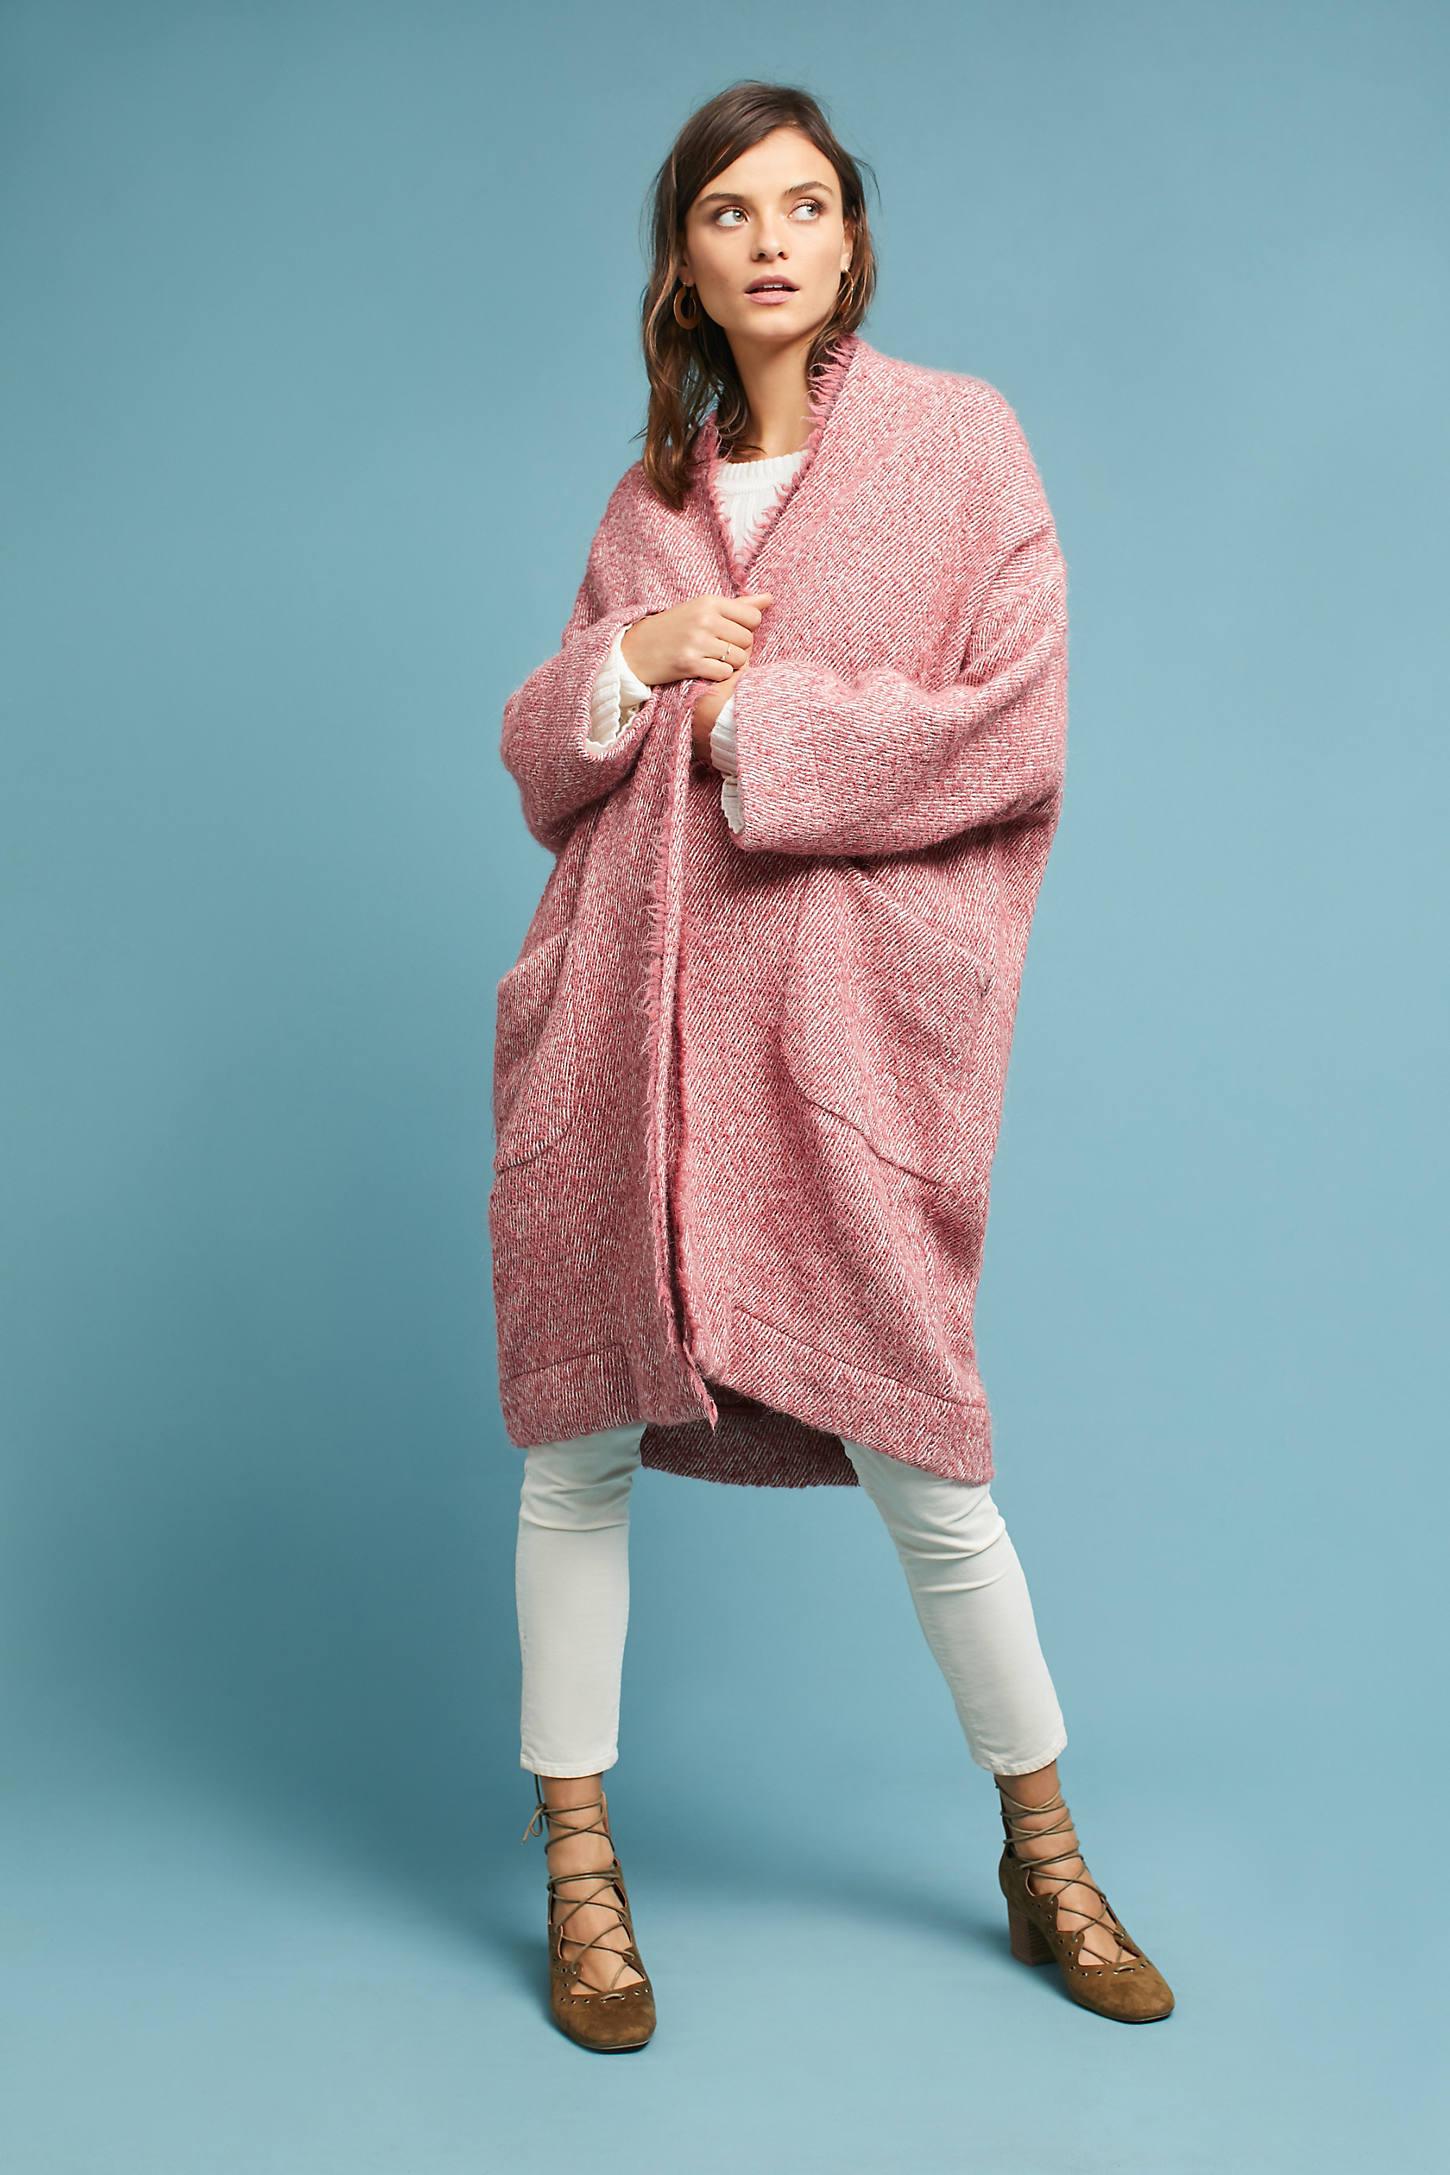 Moonlight Oversized Sweater Coat